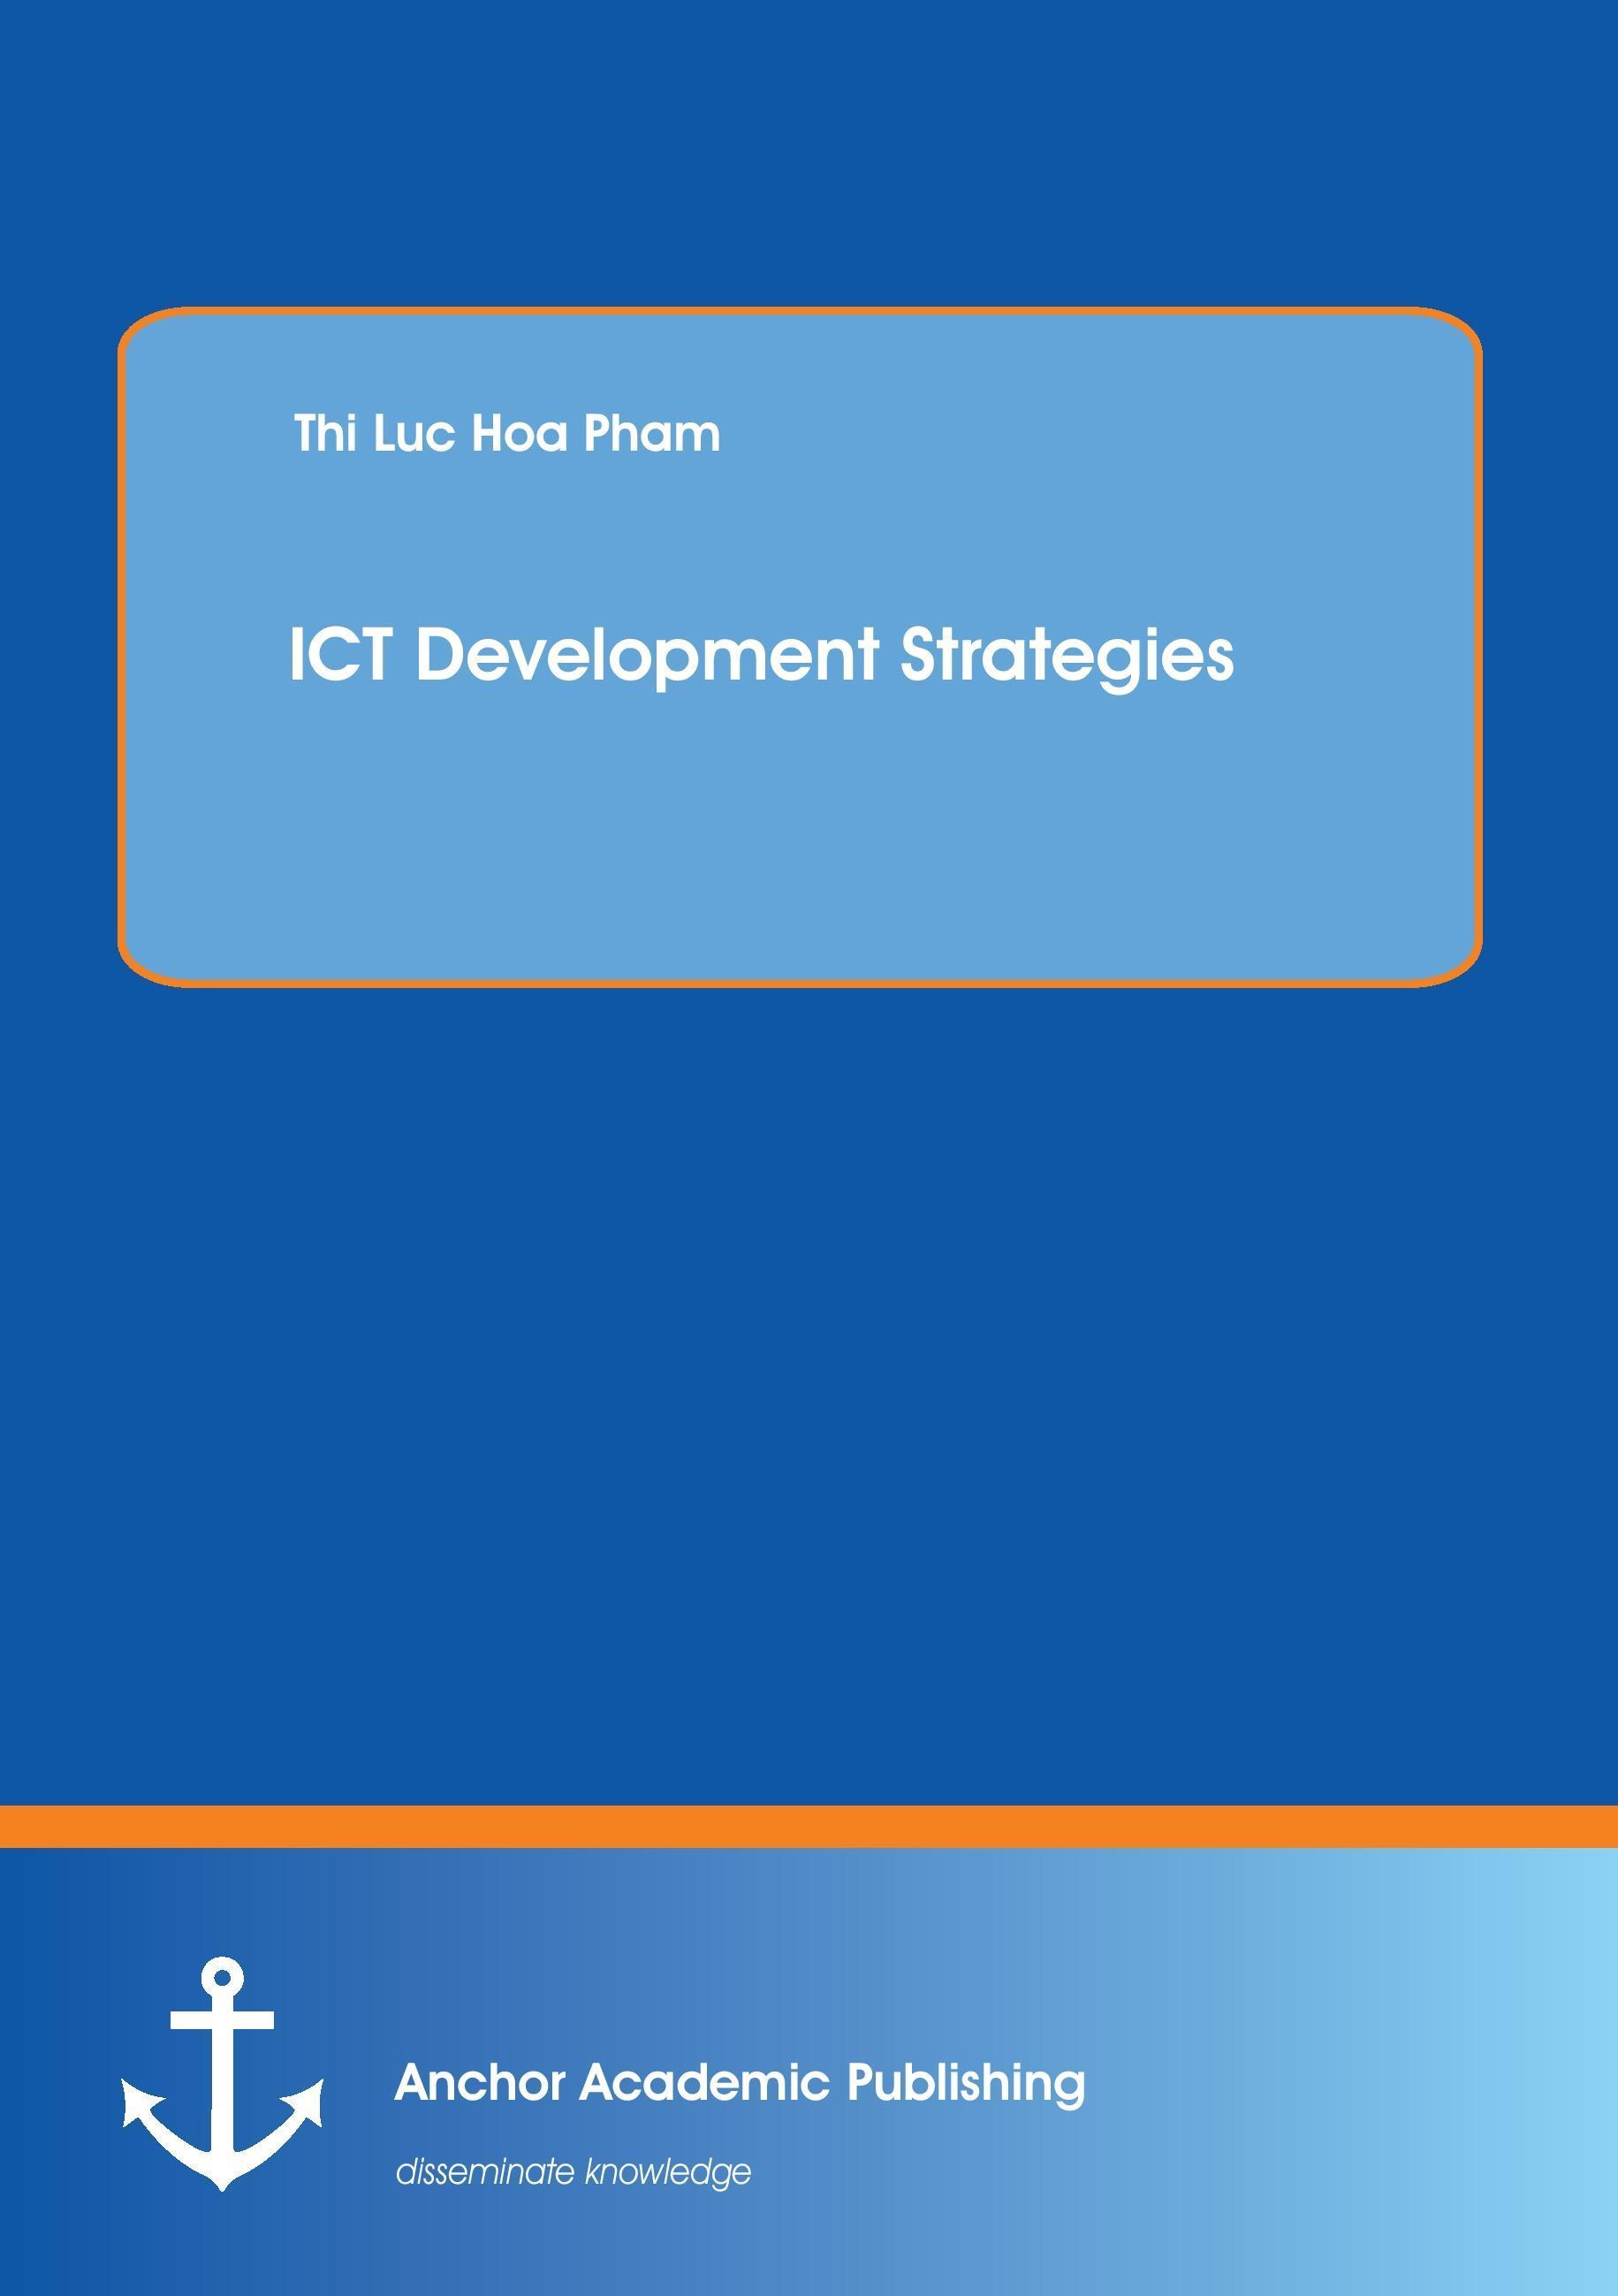 ICT Development Strategies - Thi Luc Hoa Pham -  9783954891795